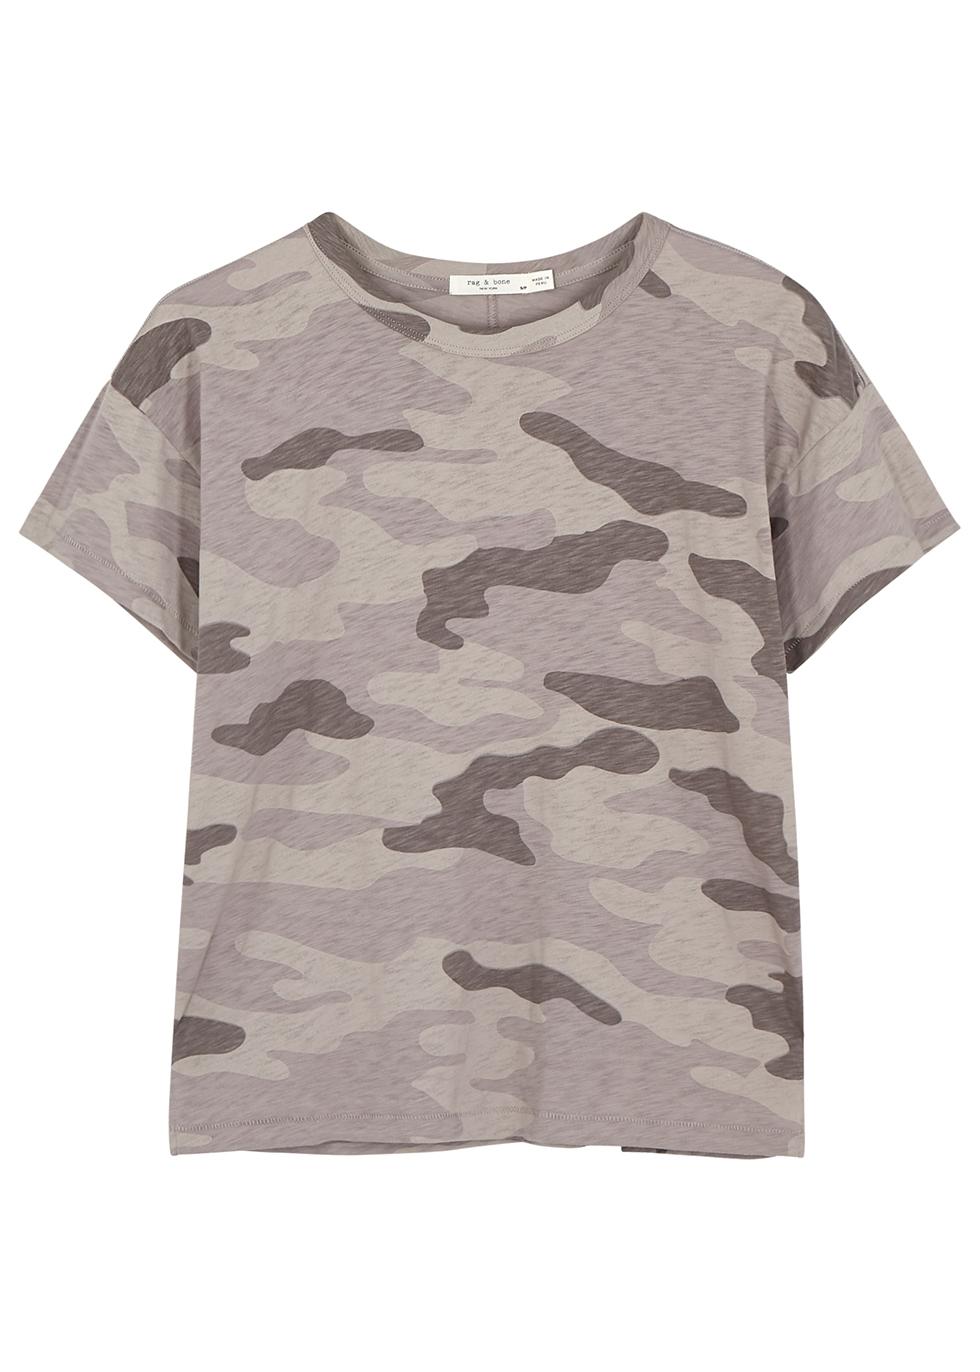 Mauve camouflage-print cotton T-shirt - rag & bone /JEAN